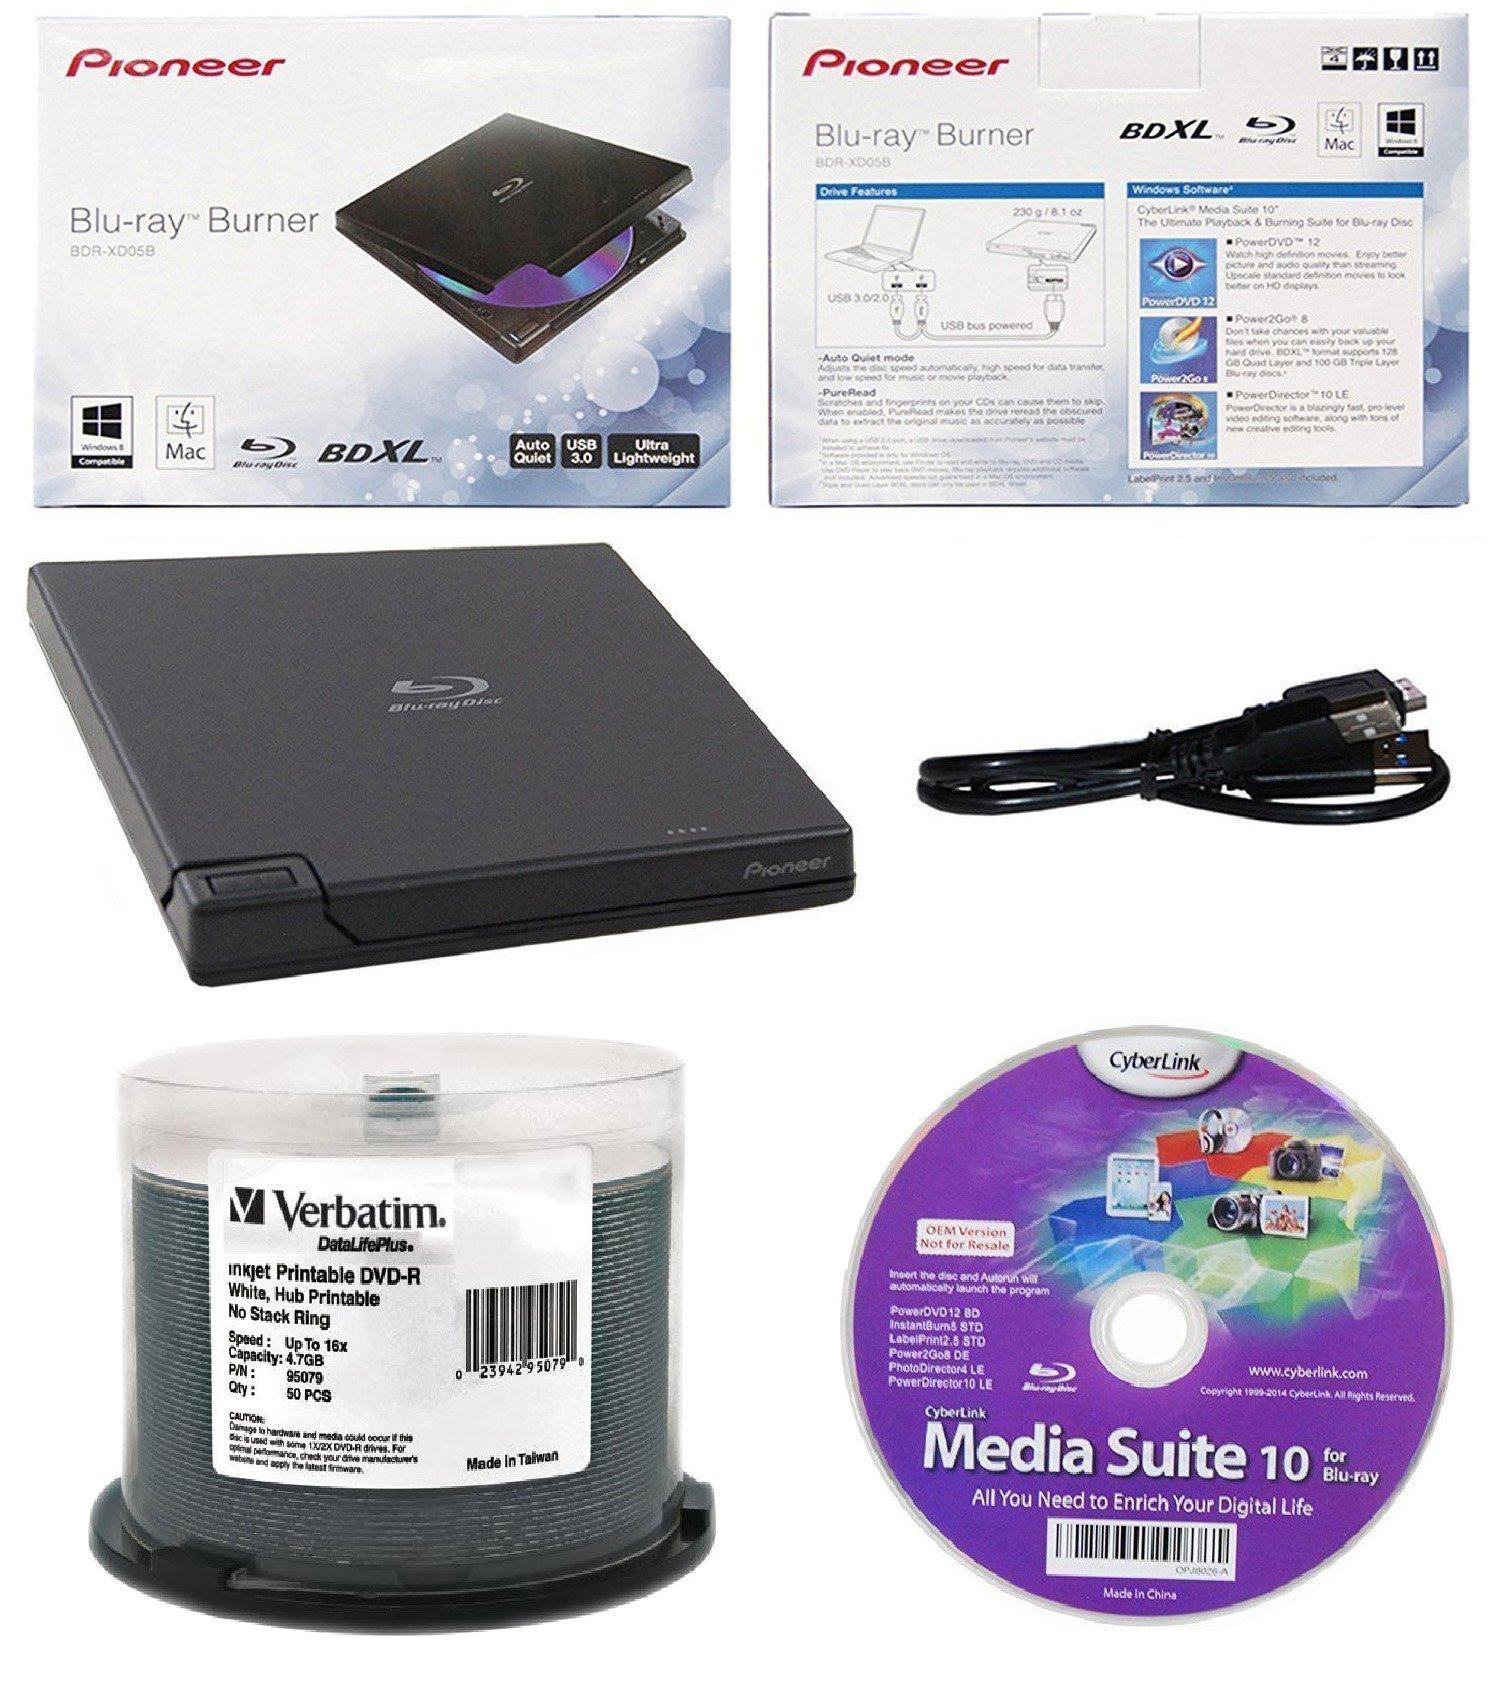 Pioneer 6x BDR-XD05B Ultra Lightweight External Blu-ray BDXL Burner, Cyberlink Software and USB Cable Bundle with 50pk DVD-R Verbatim 4.7GB 16X DataLifePlus White Inkjet, Hub Printable